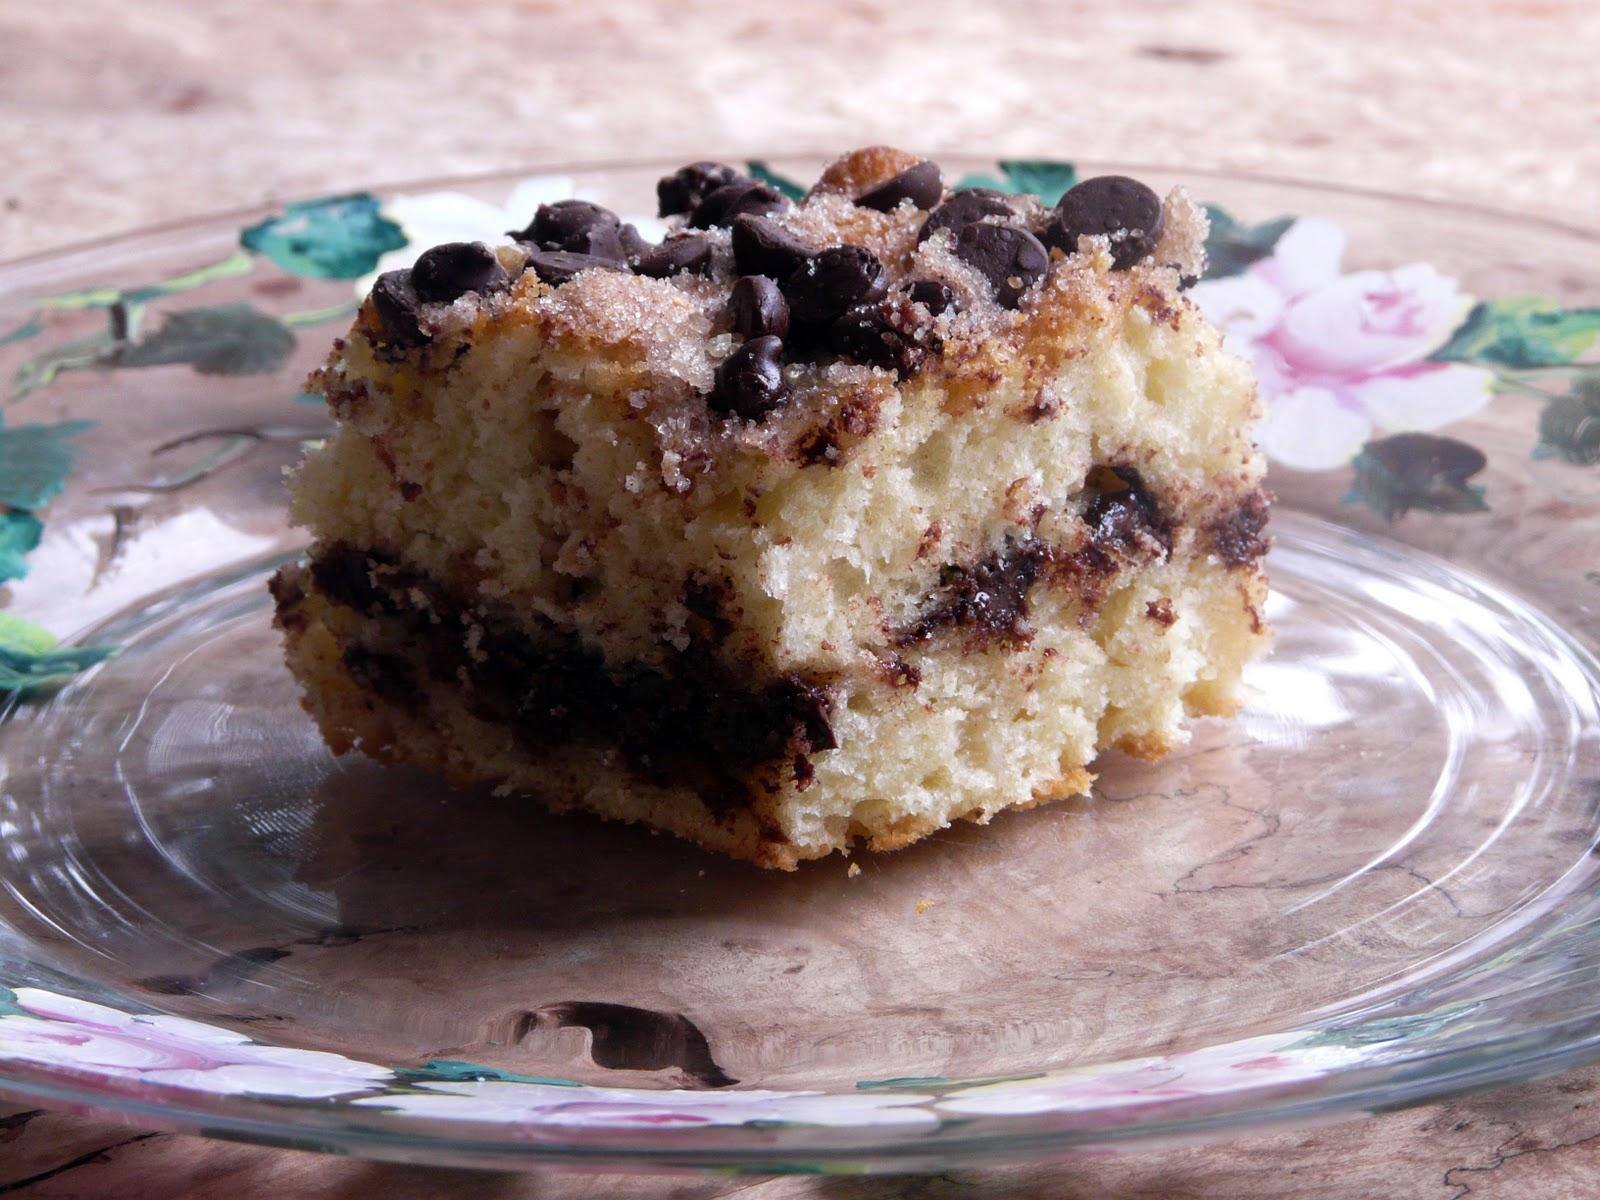 Thibeault's Table: Cinnamon-Chocolate Chip Sour Cream Coffee Cake